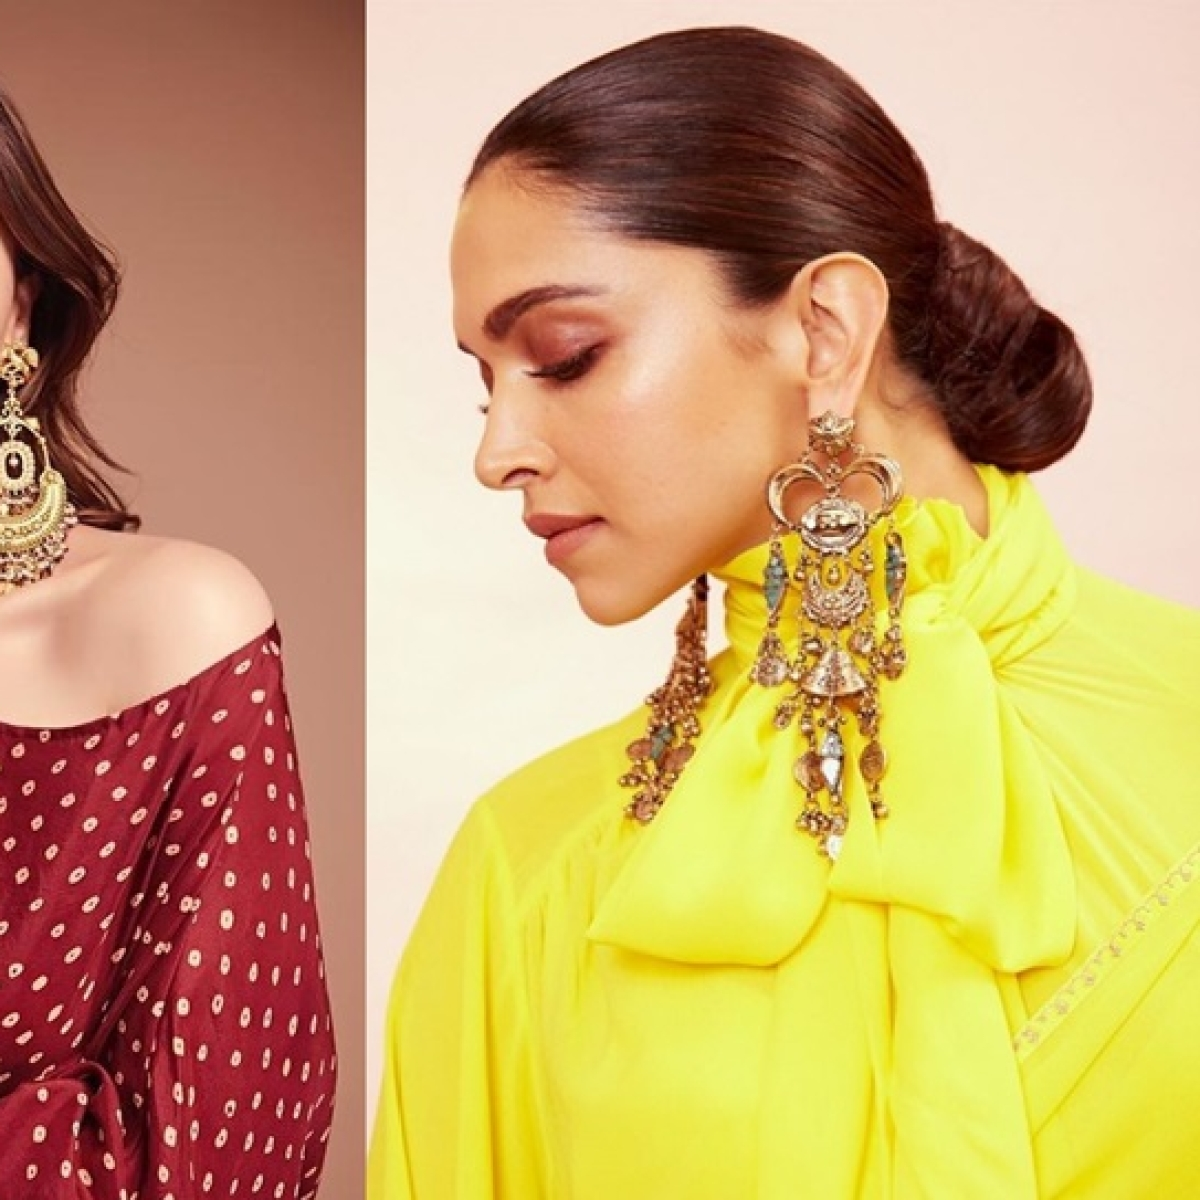 Diwali 2019: Bollywood inspired fashion trends to rock this festive season